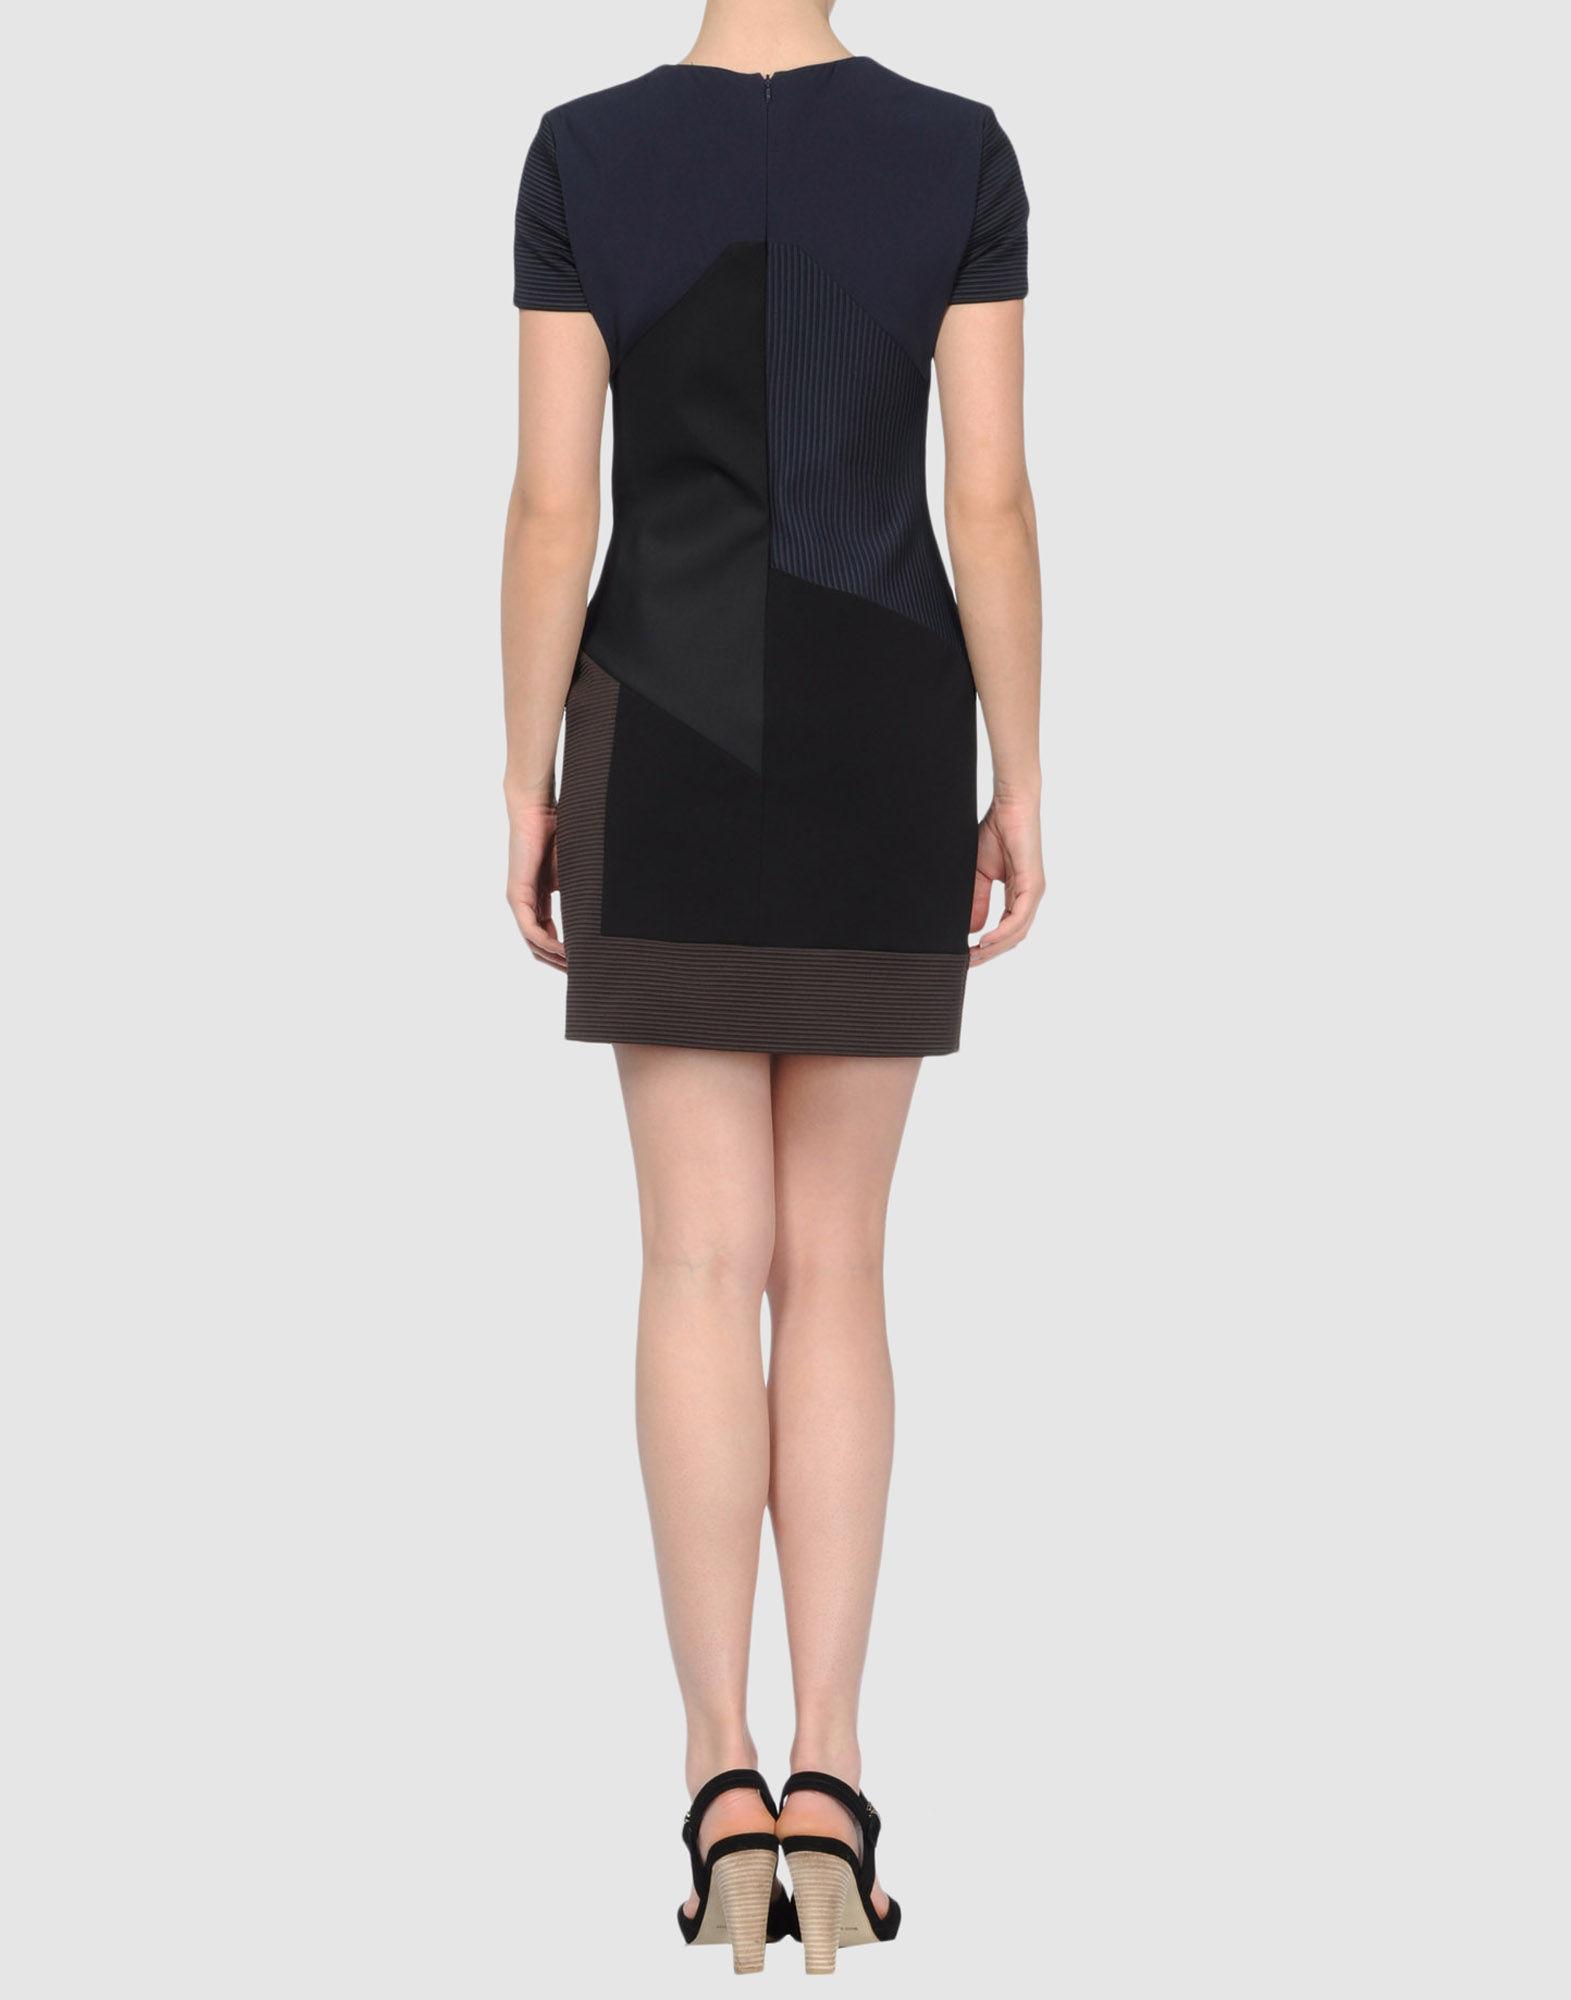 34209896GT 14 r - Evening Φορεματα Versace 2011 2012 Κωδ.02